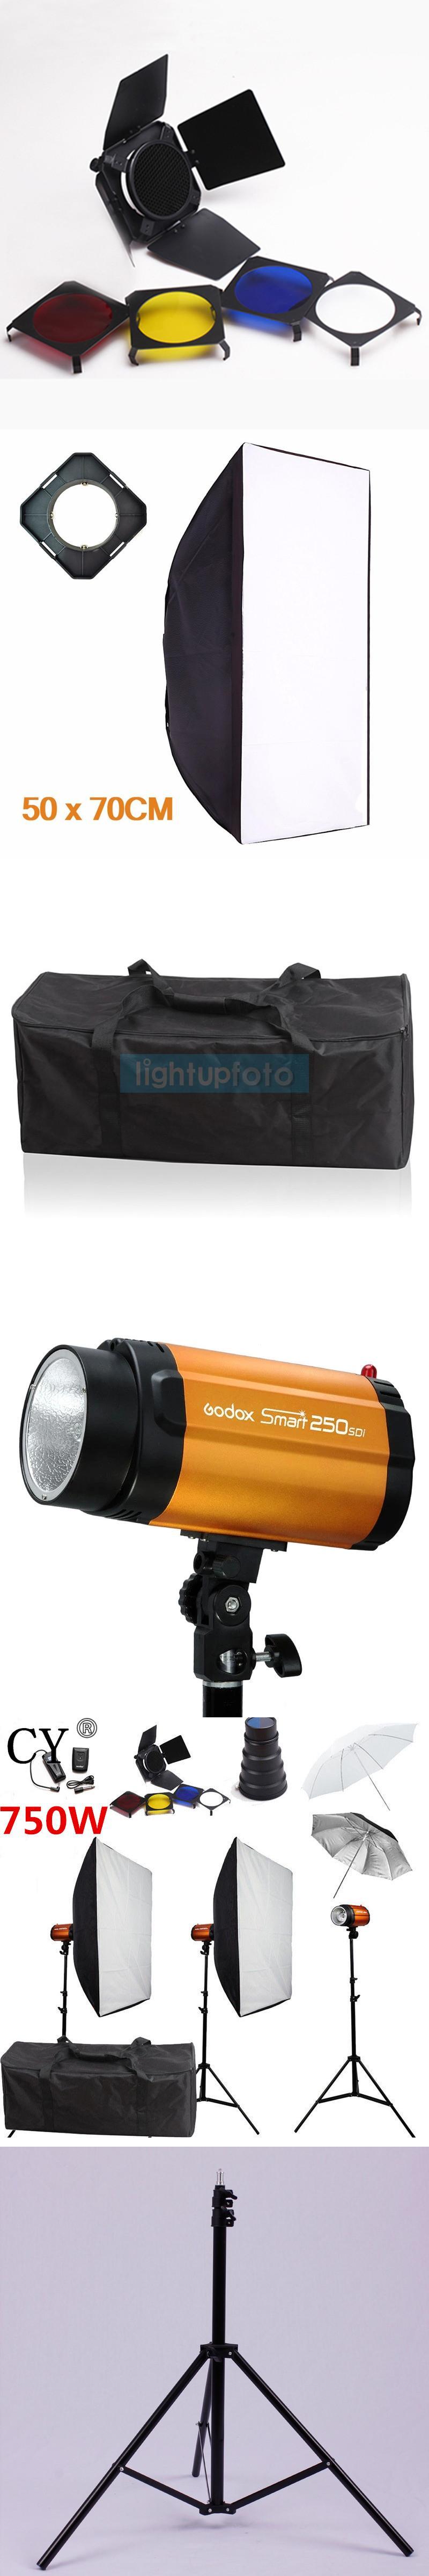 CY Photography Studio Flash Lighting Kits 750ws 220V Flash Light+ ...